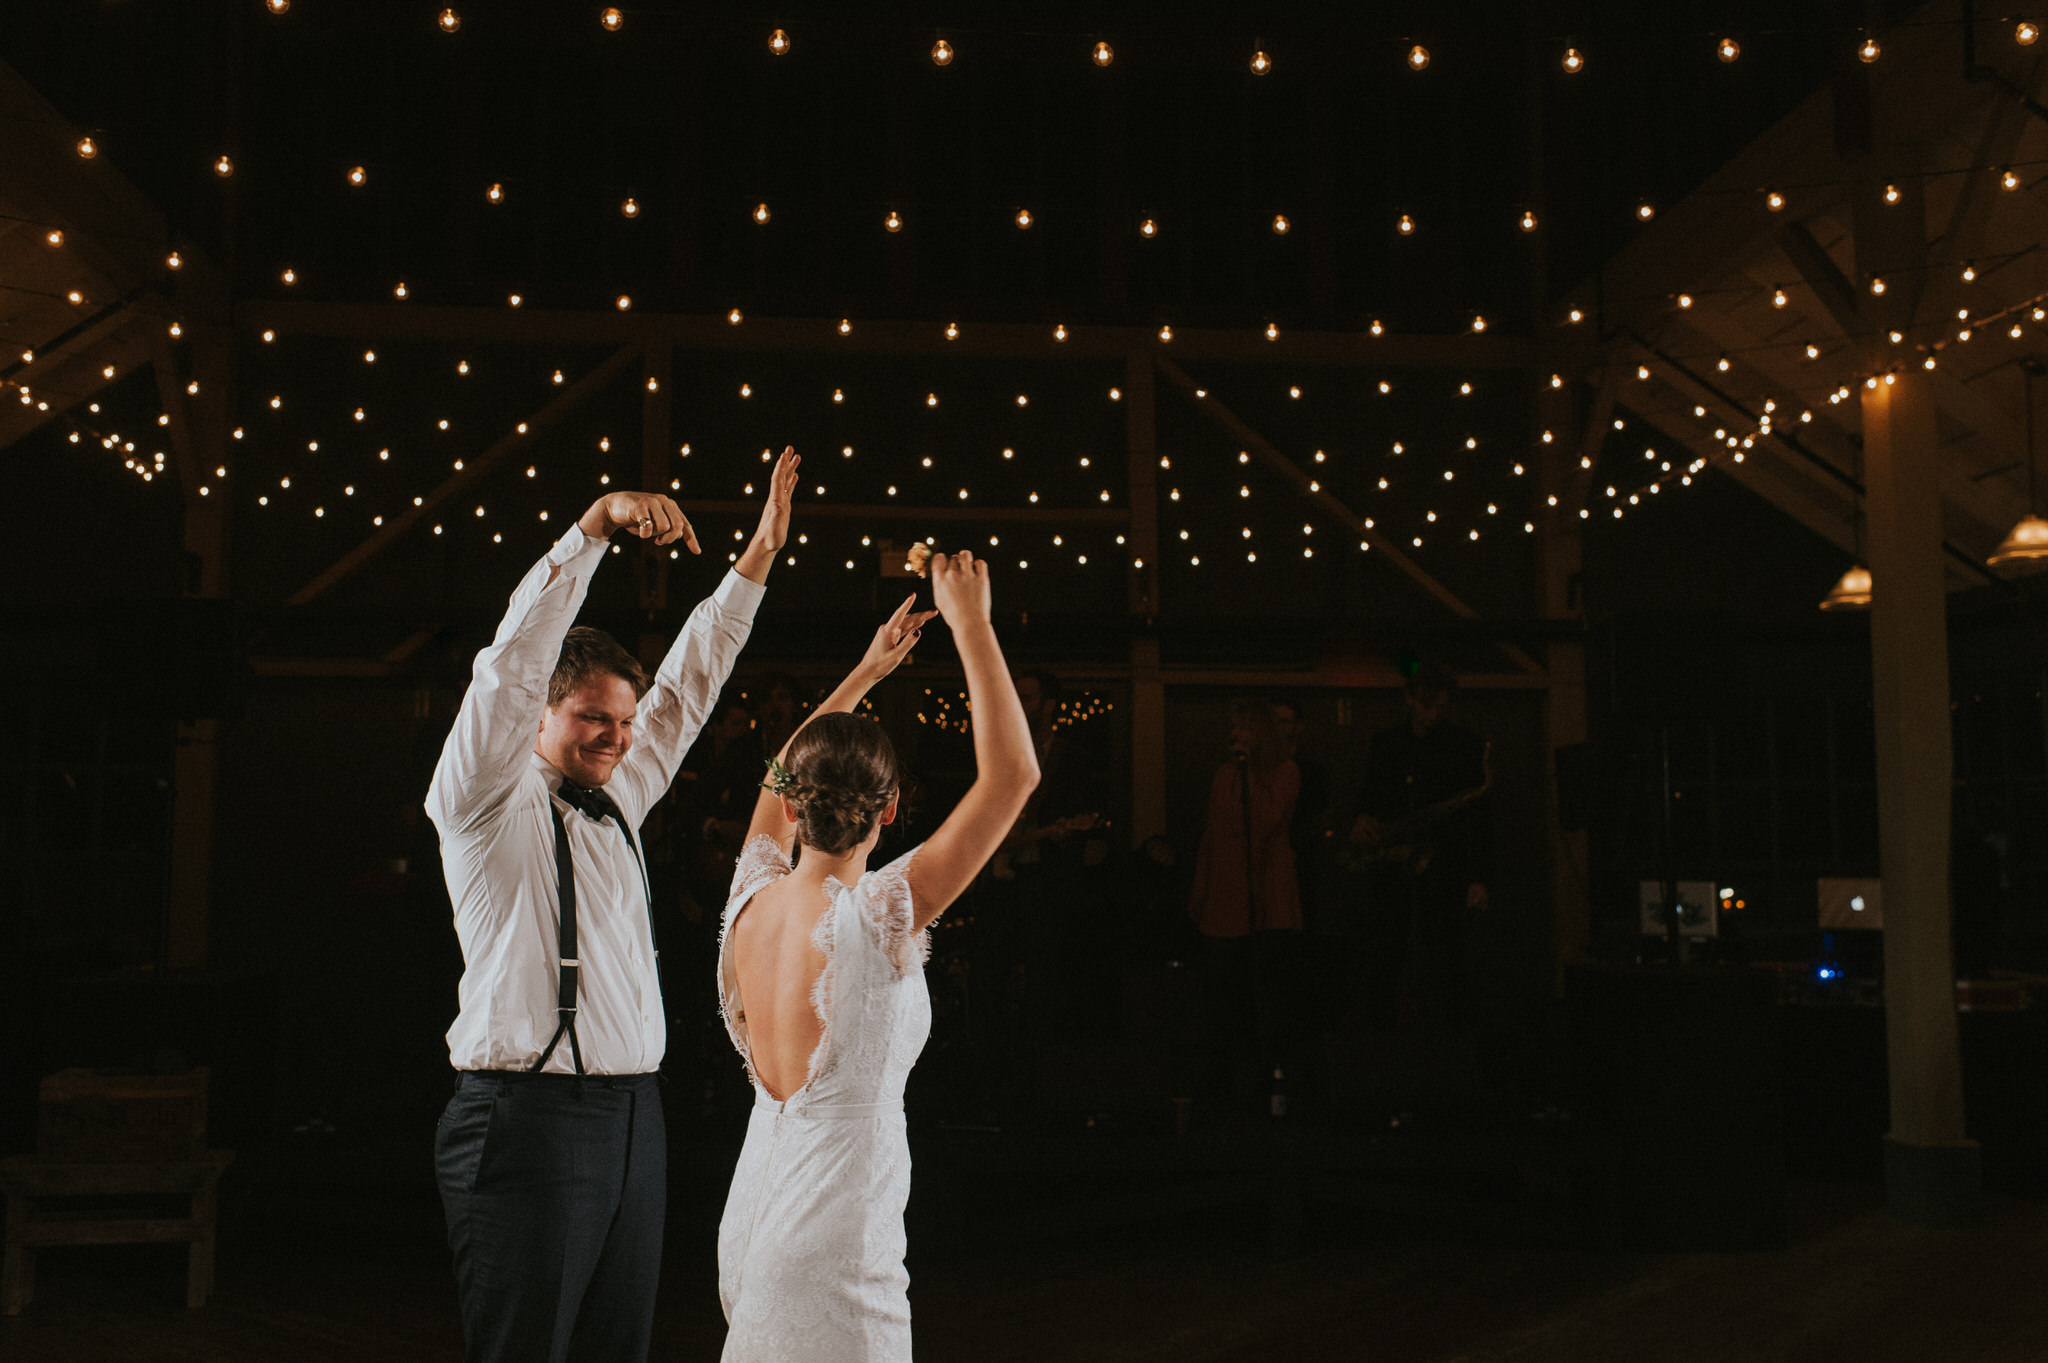 scarletoneillphotography_weddingphotography_prince edward county weddings175.JPG